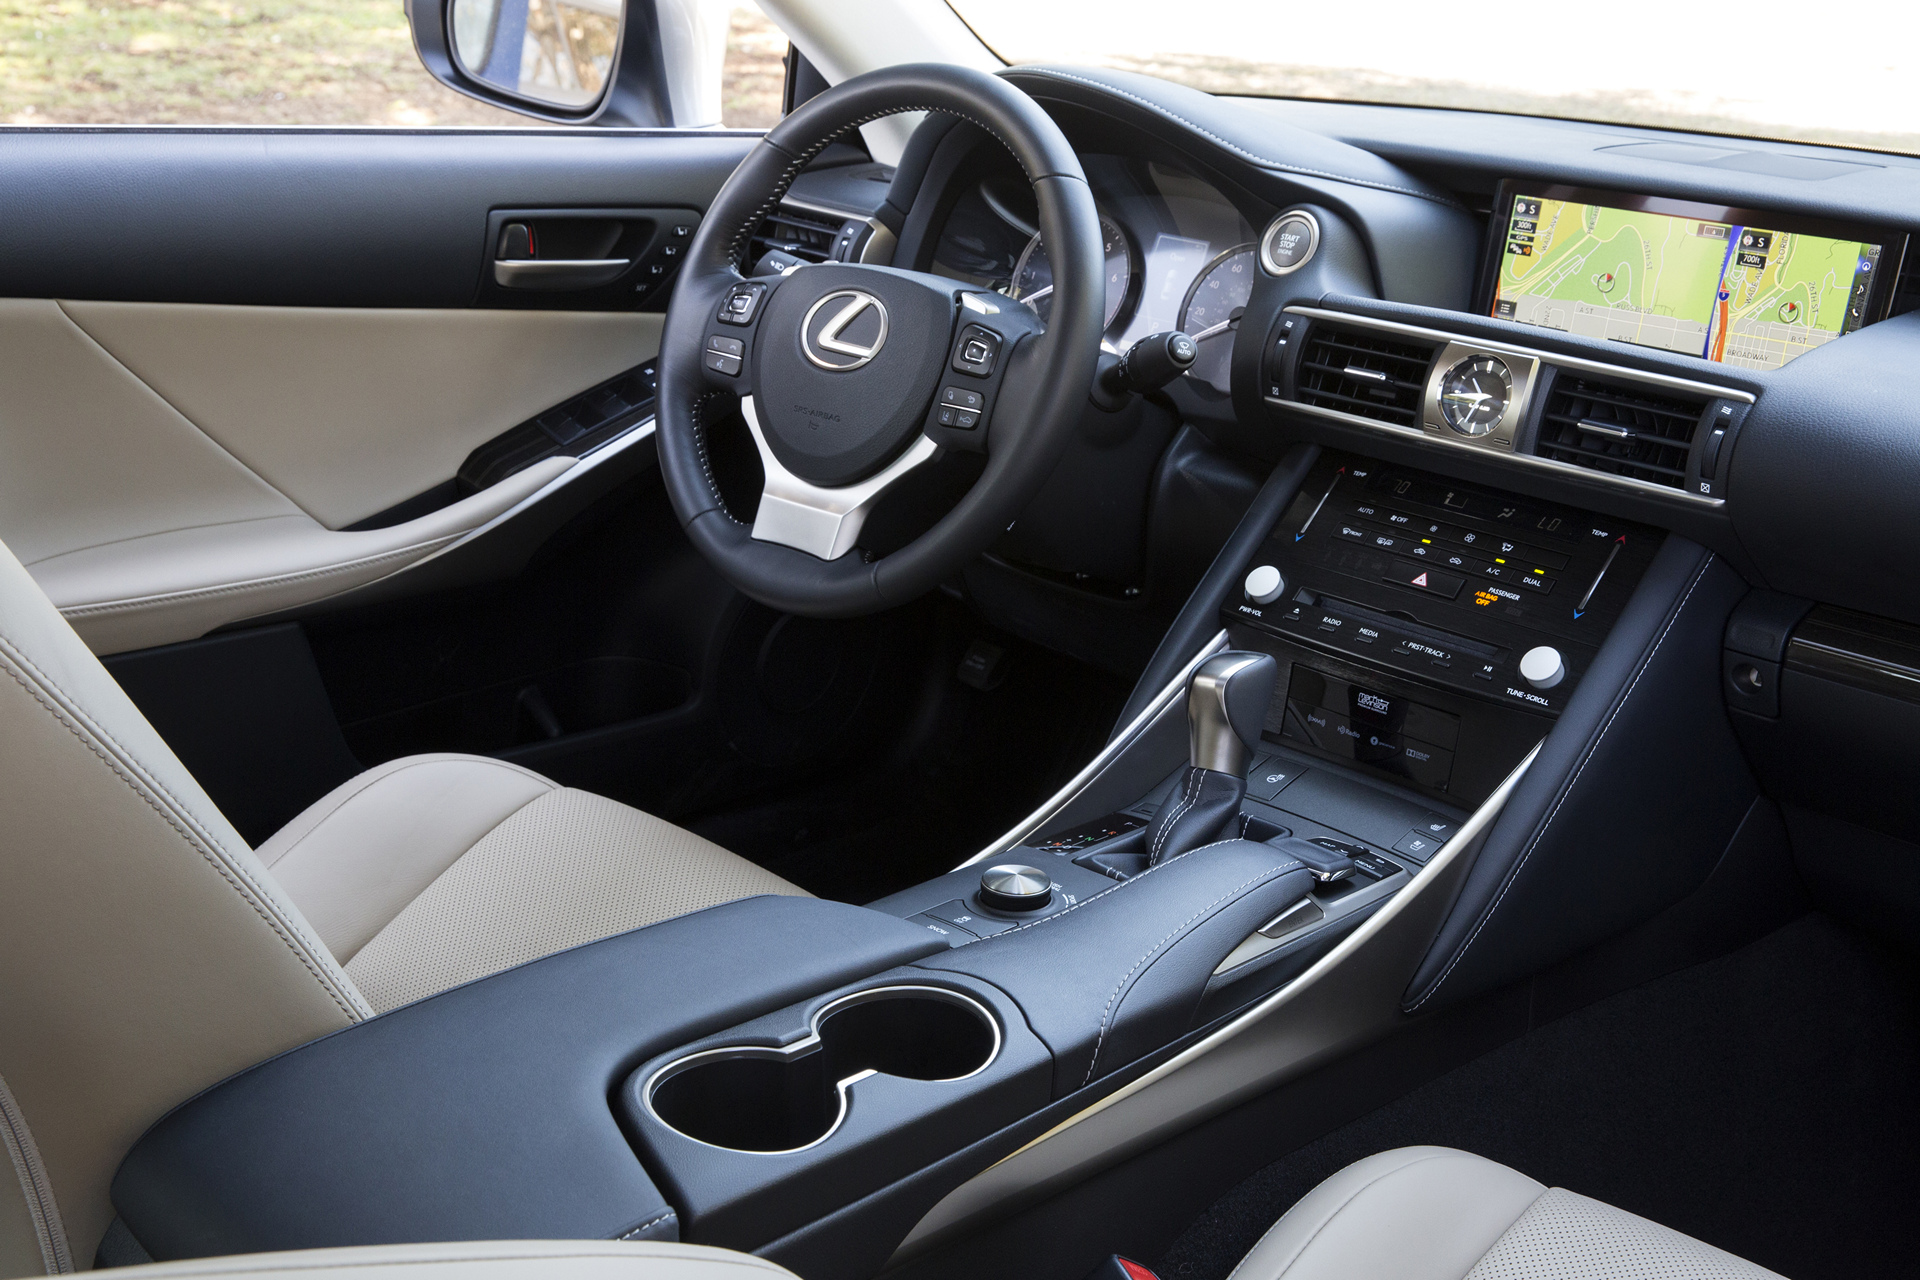 2017 Lexus IS 200t © Toyota Motor Corporation